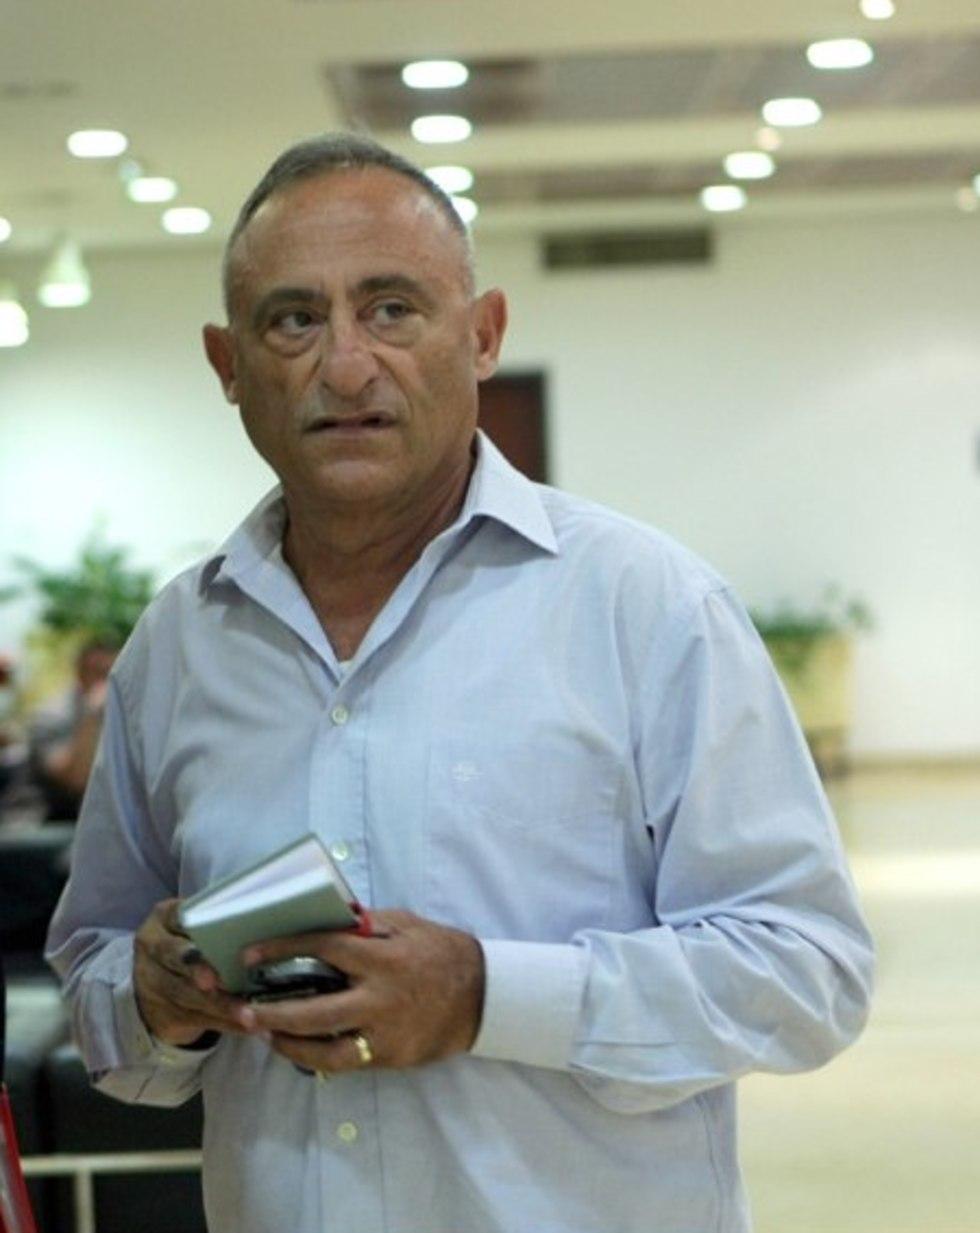 שמעון שיפר (צילום: אלכס קולומויסקי)